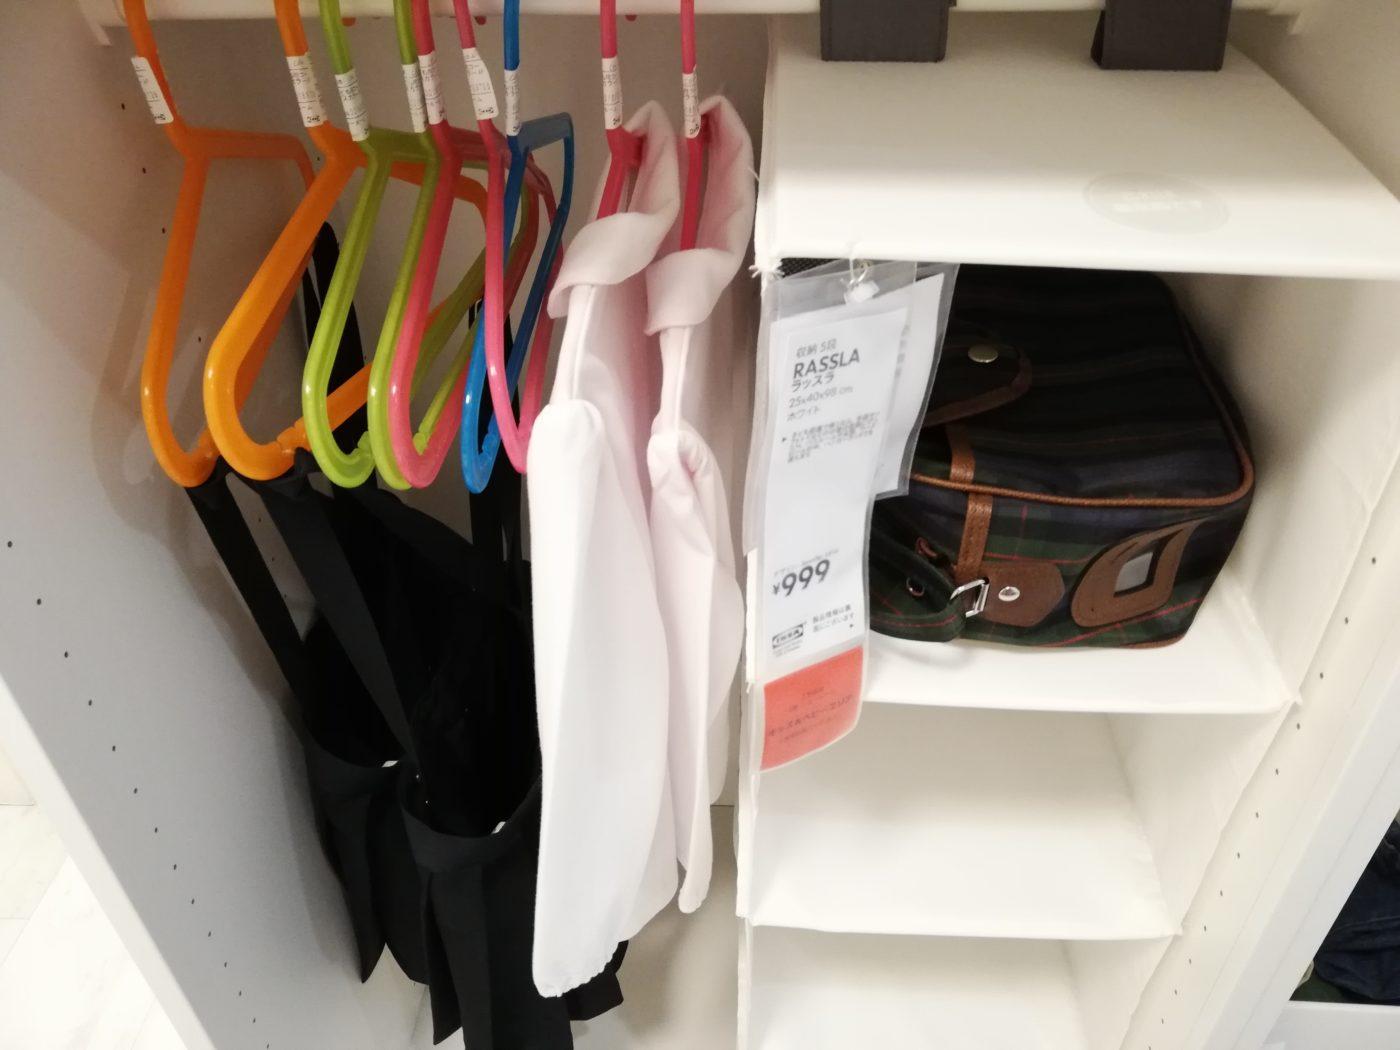 IKEAの幼稚園収納展示